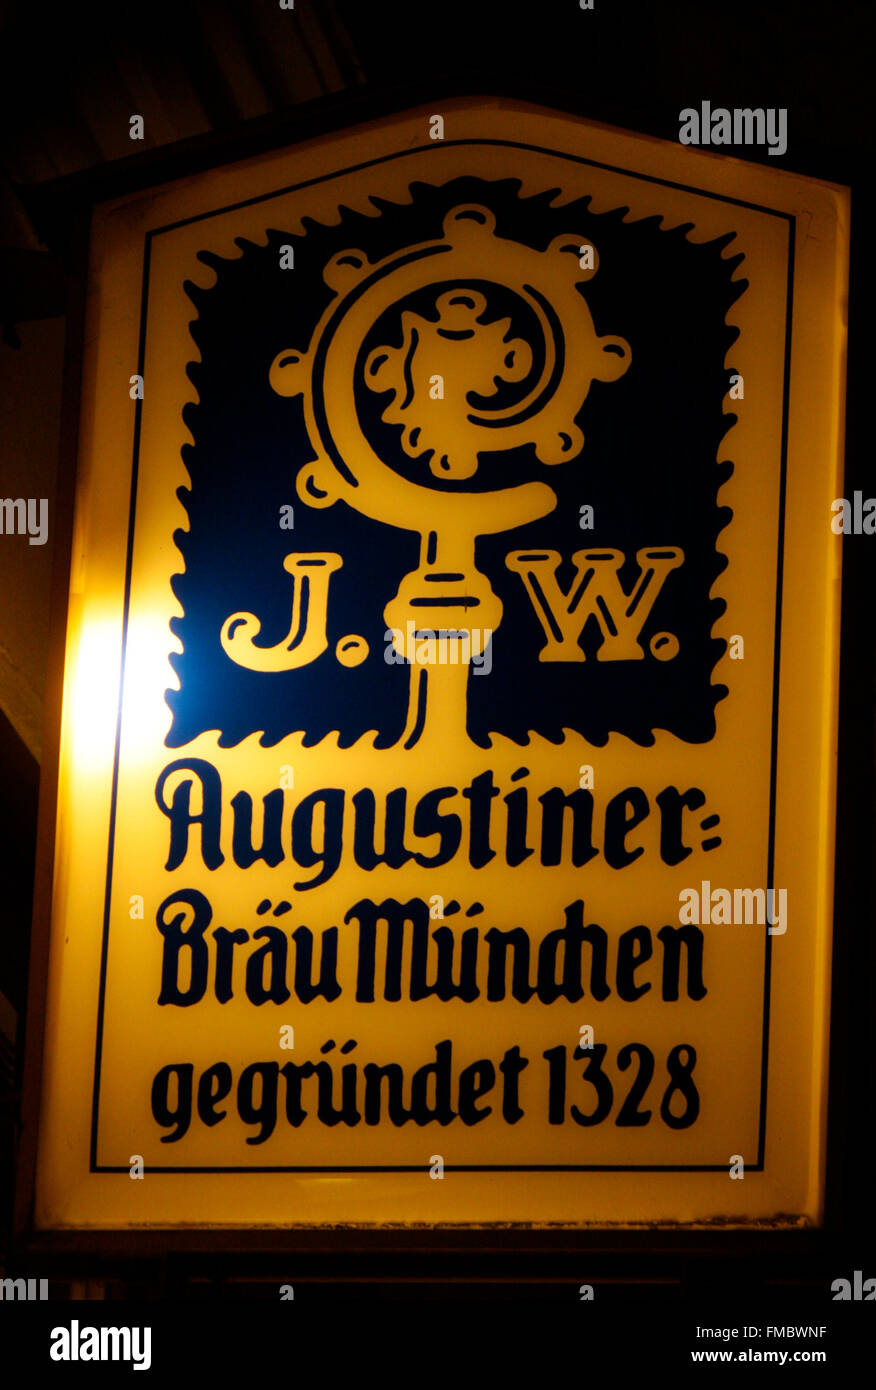 Markenname: 'Augustiner Braeu Muenchen', Berlin. - Stock Image